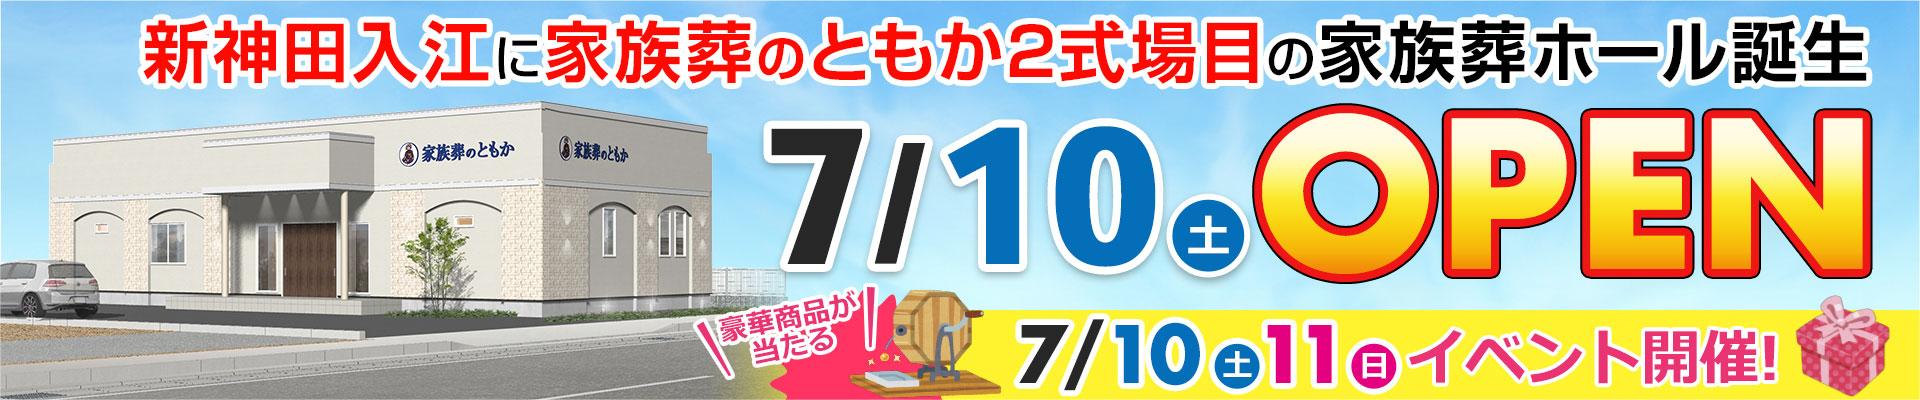 金沢新神田入江 7/10新規オープン